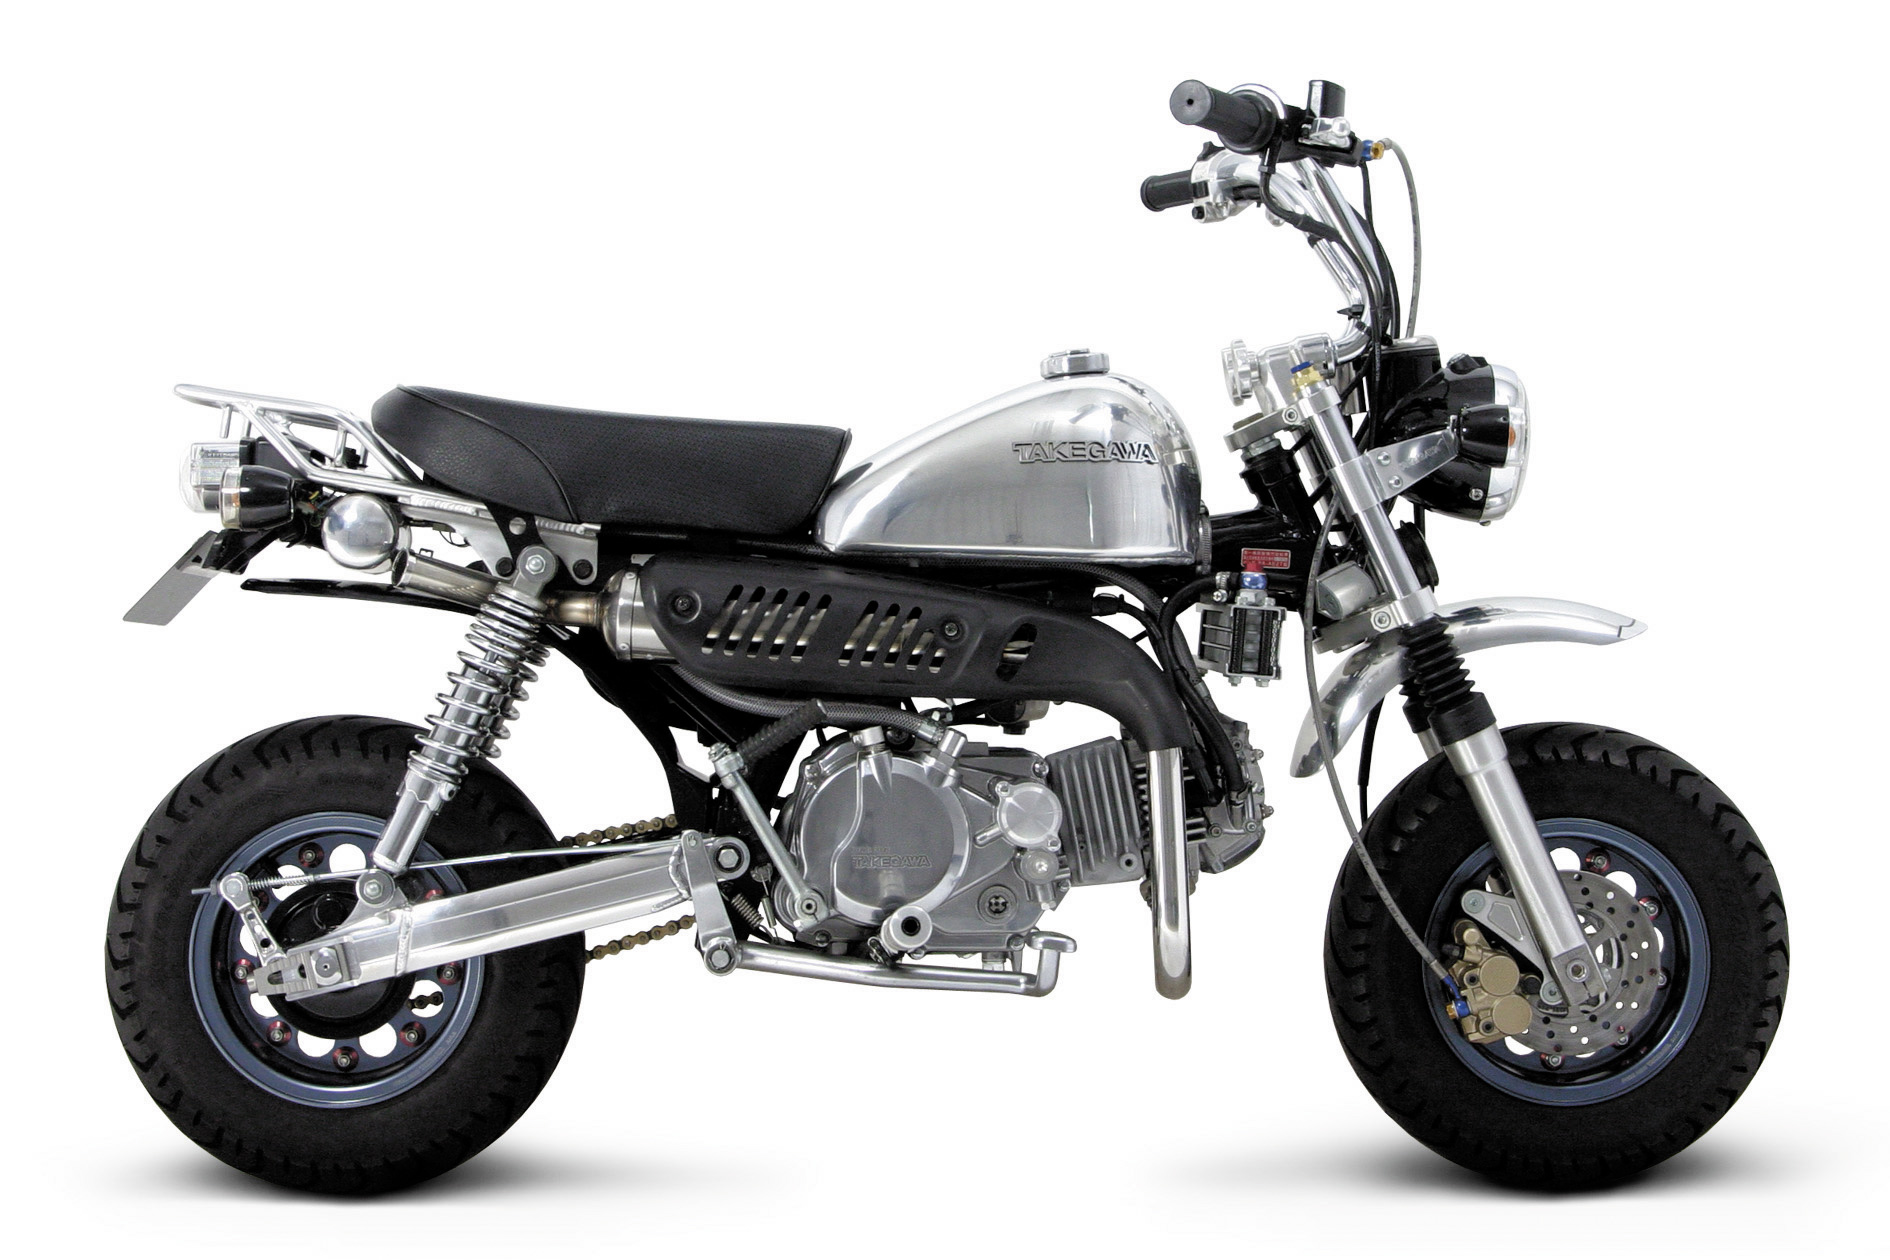 Takegawa Z Style Type 2 Exhaust System